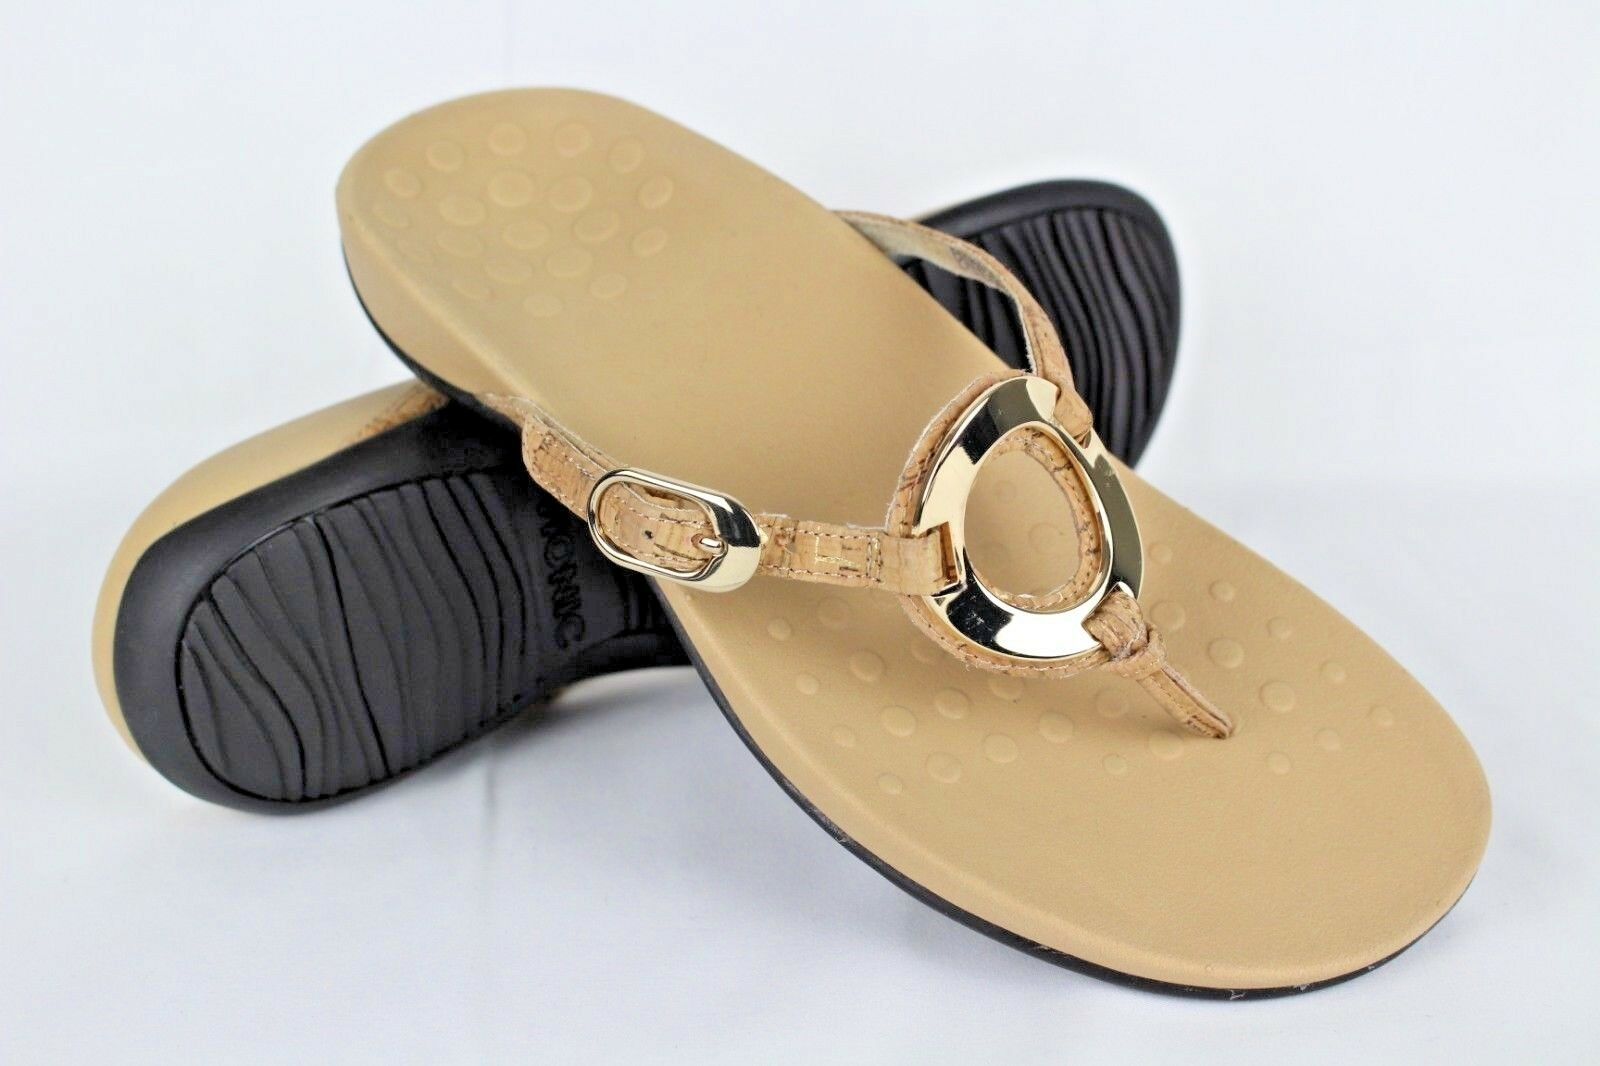 New Vionic Orthaheel Women's Rest Karina Thong Sandals Size 11m gold Cork